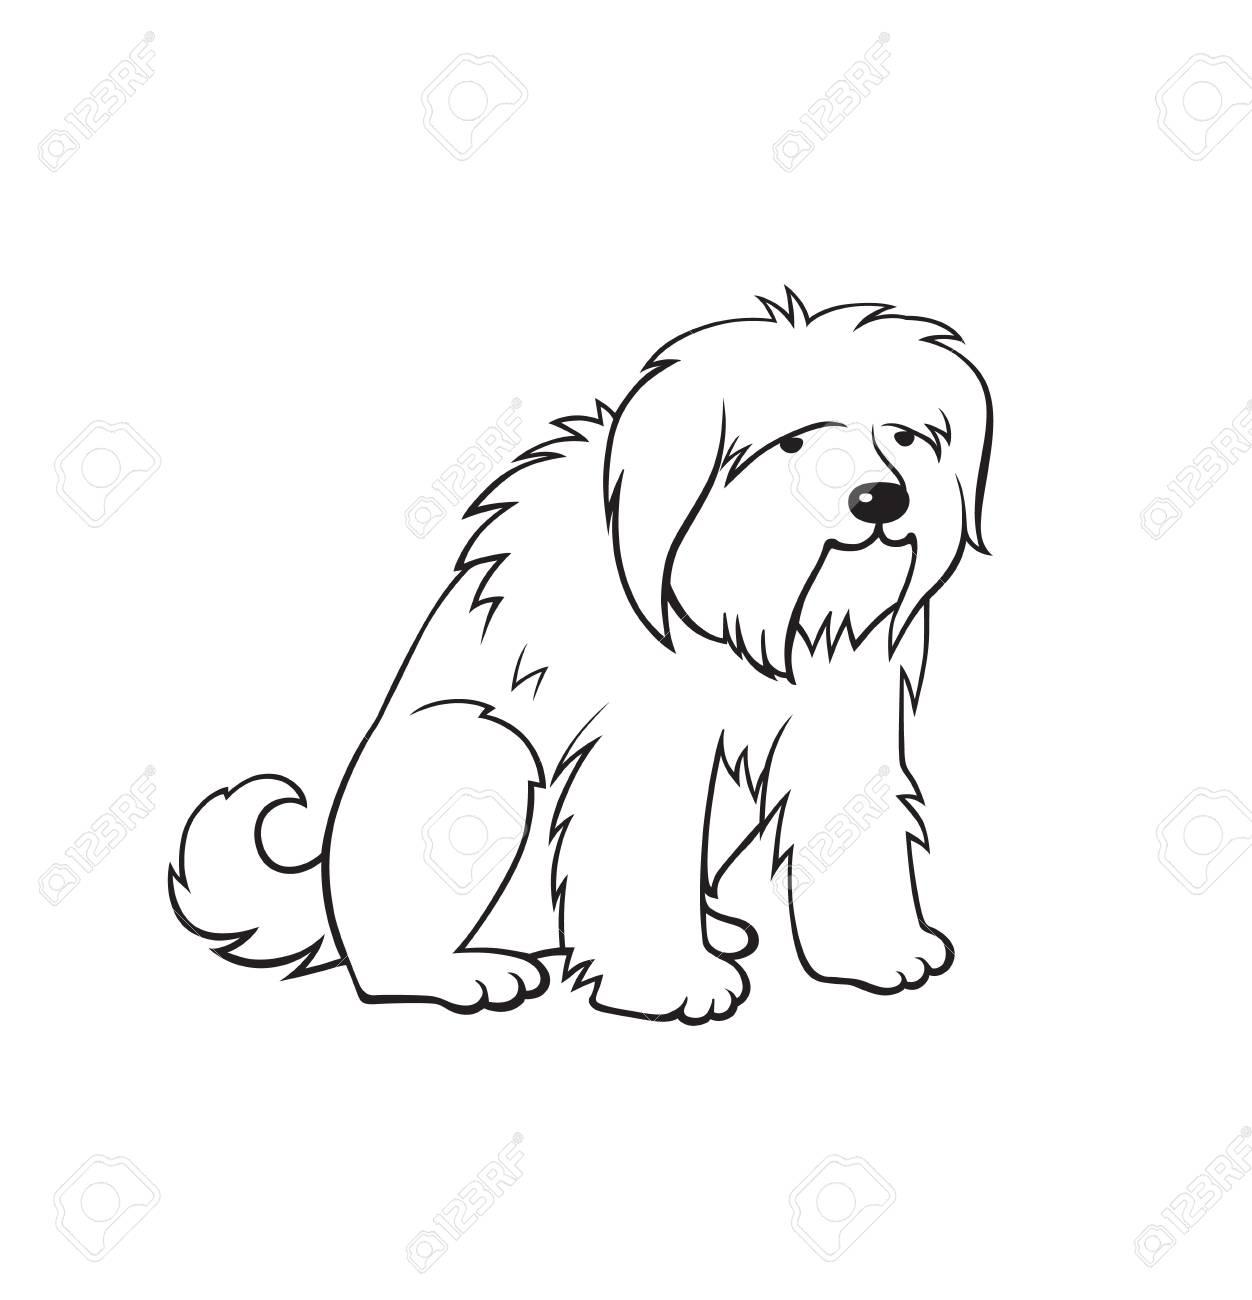 Cartoon Cute Big Dog Monochrome Illustration For Perfect Card